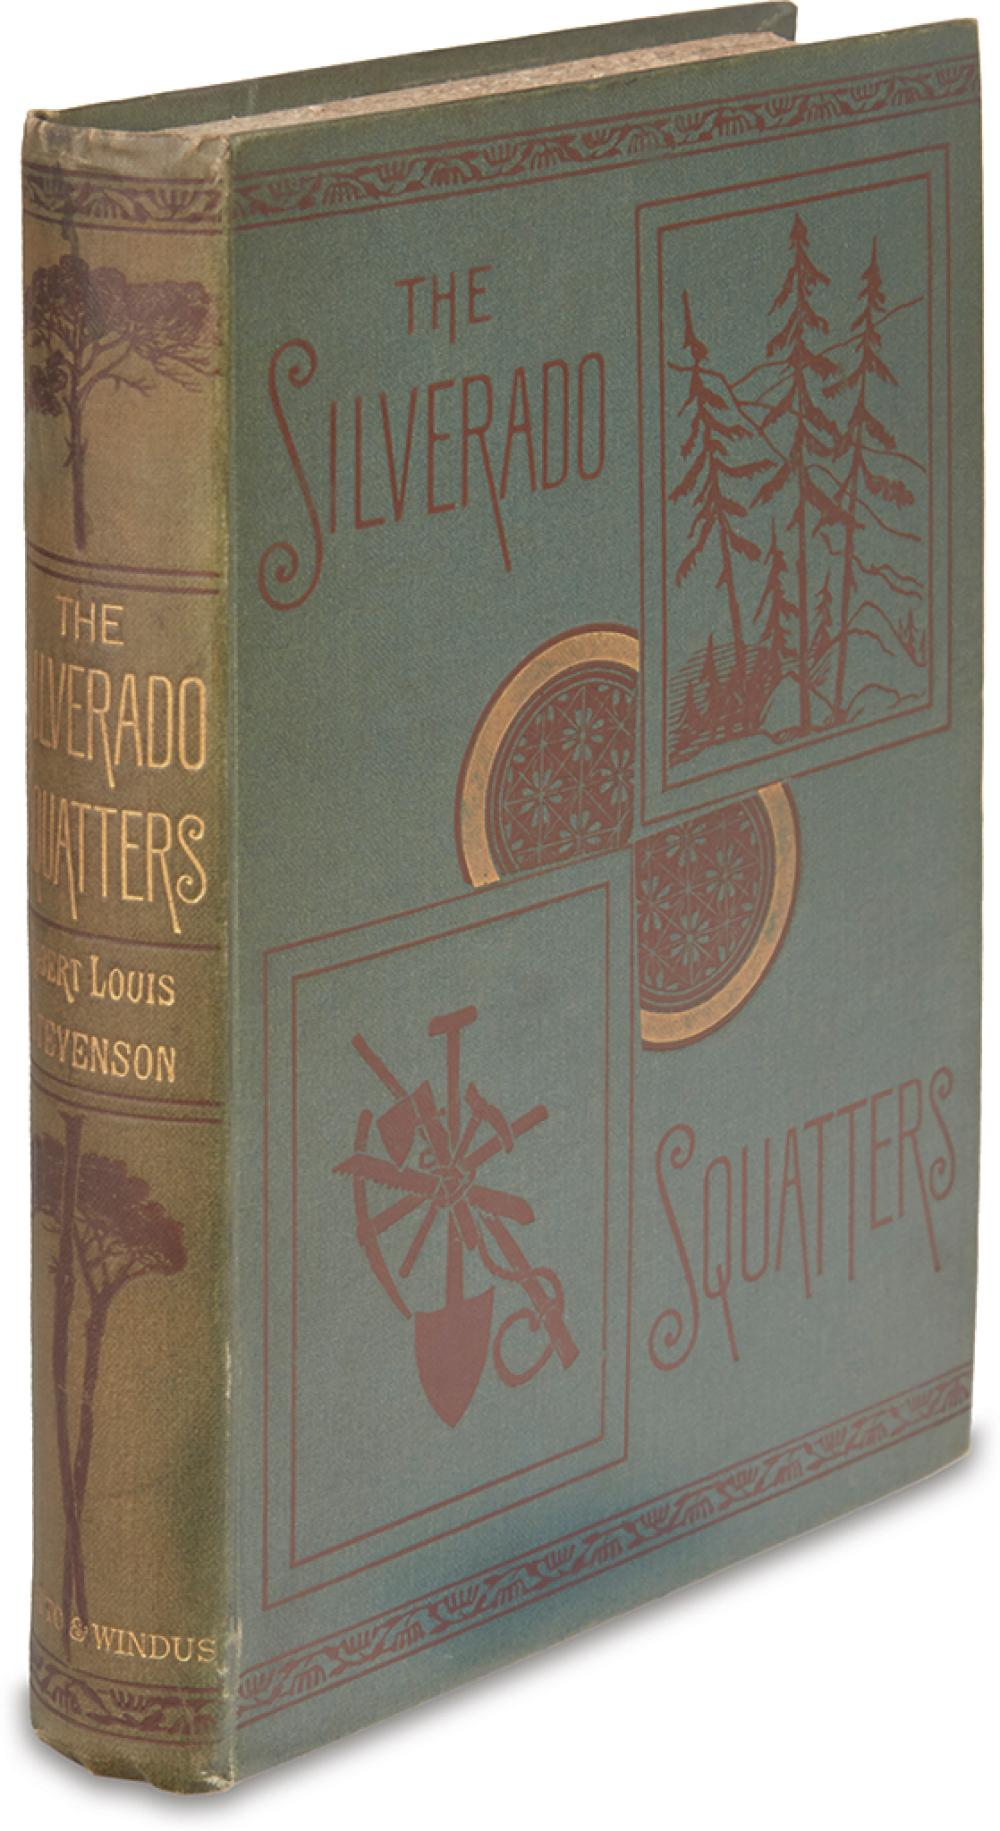 STEVENSON, ROBERT LOUIS. Silverado Squatters.